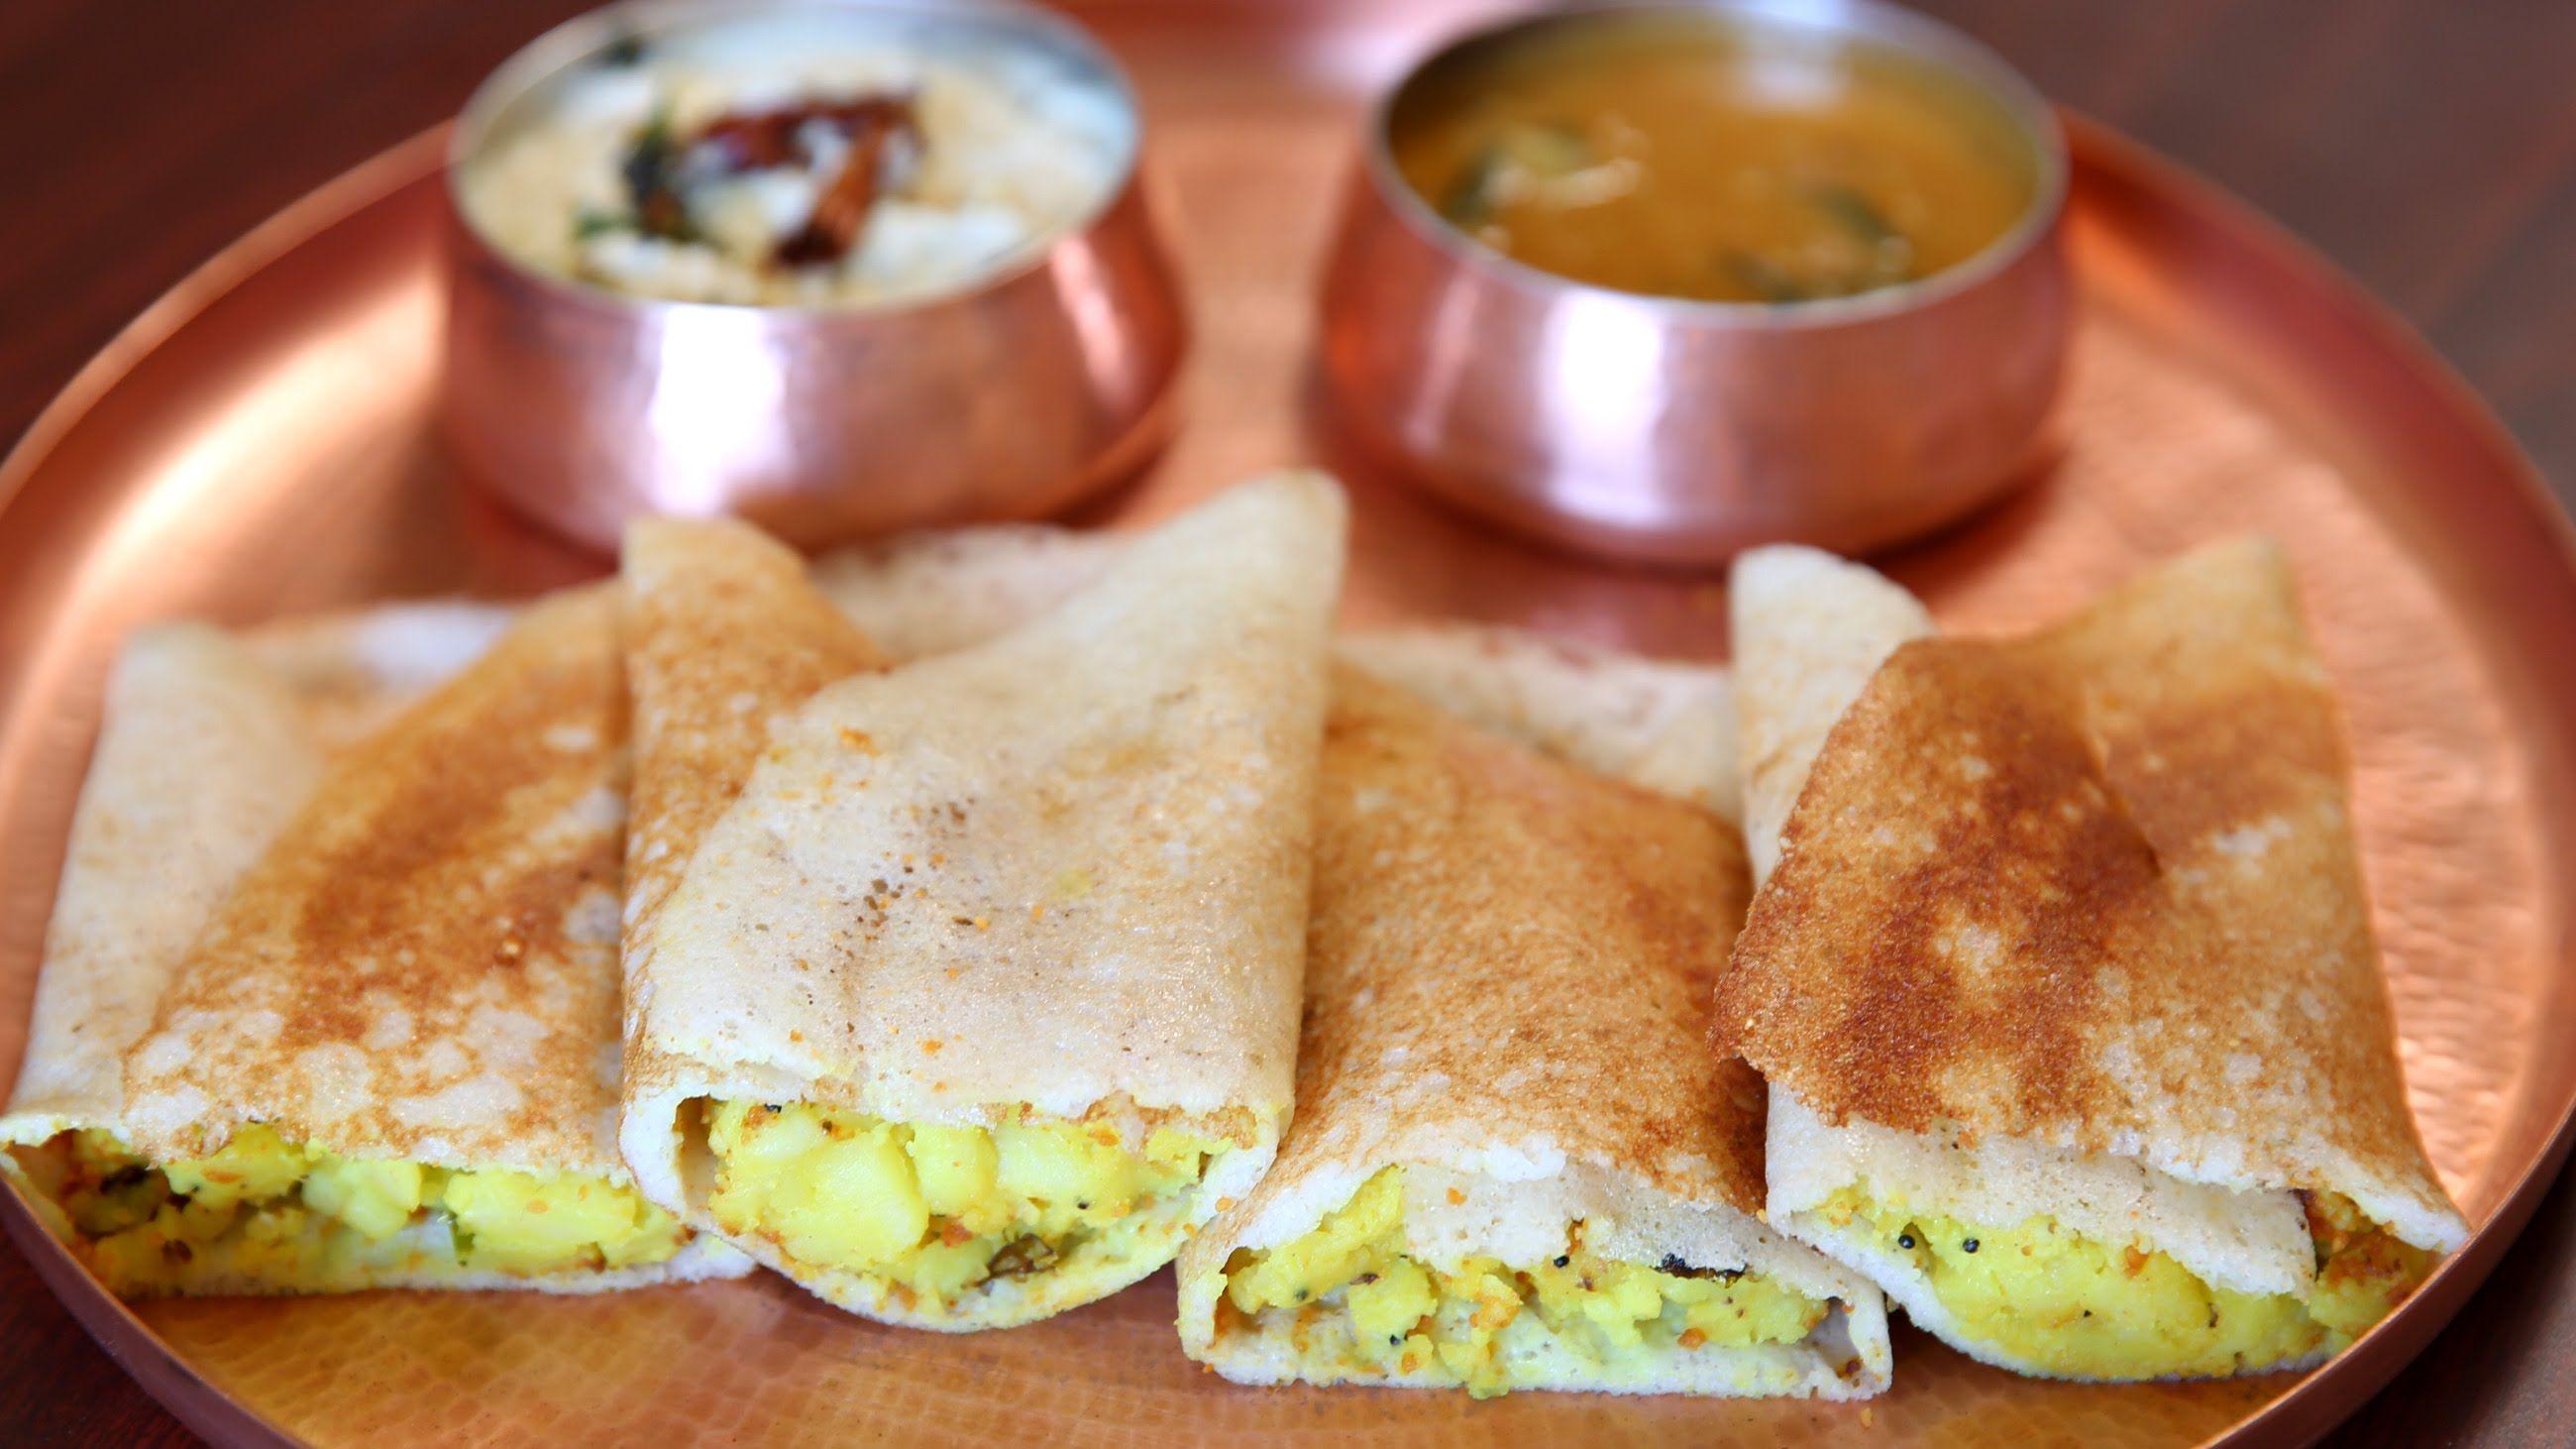 Masala dosa recipe popular south indian breakfast recipe divine masala dosa recipe popular south indian breakfast recipe divine tast forumfinder Choice Image